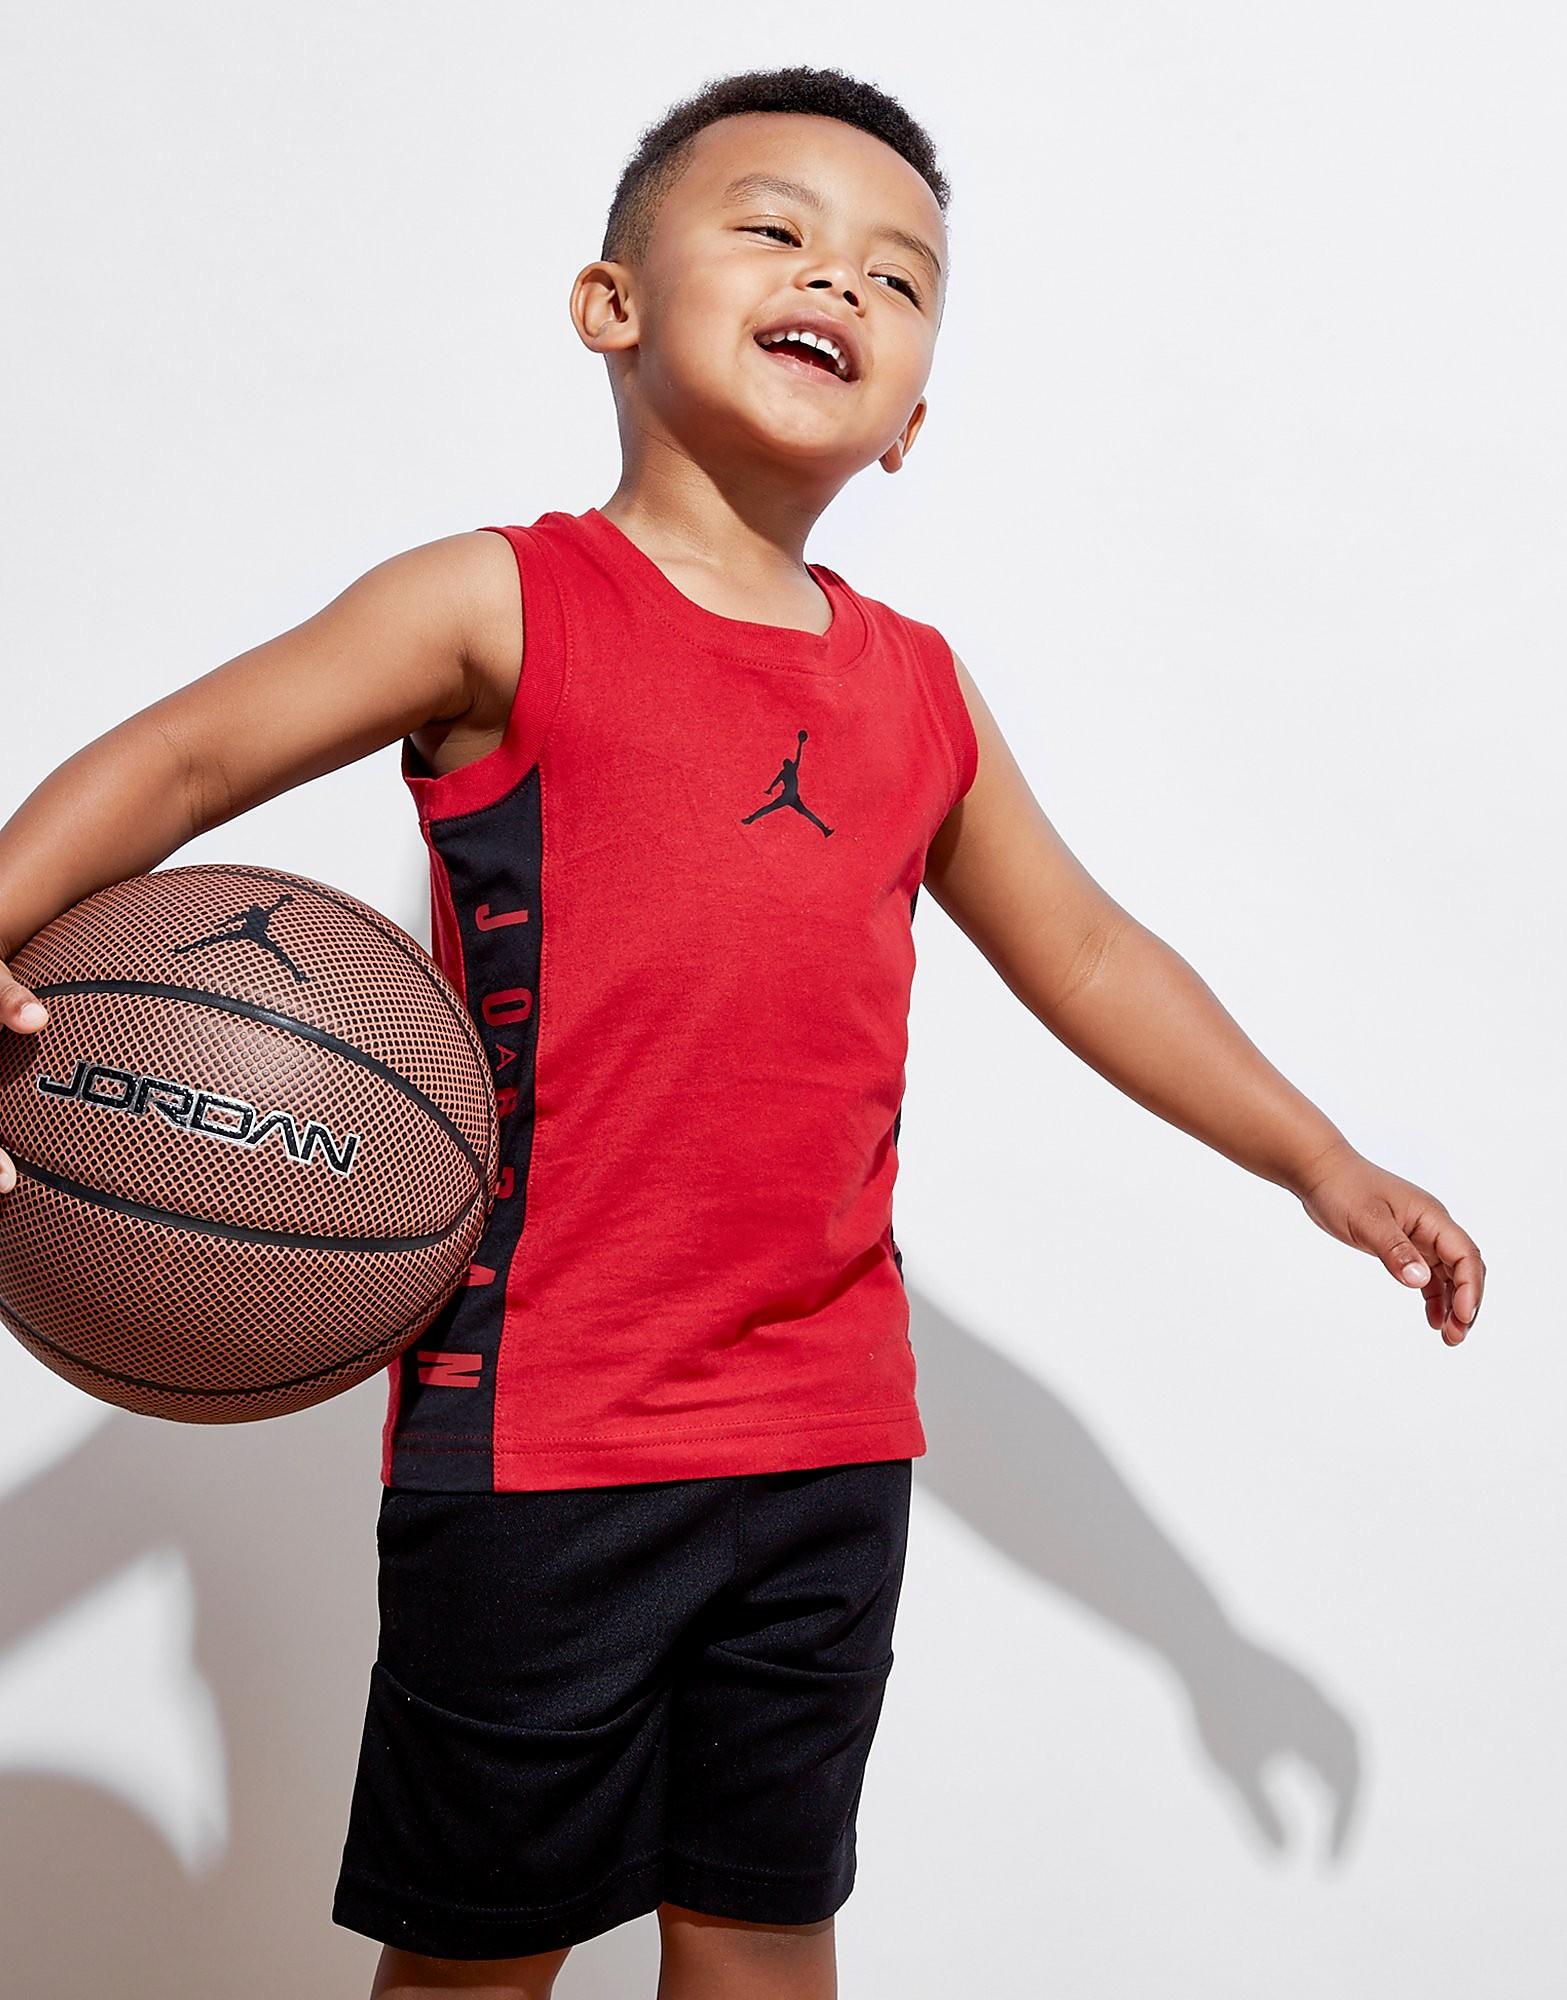 Jordan Ensemble Air 23 Rise Basketball Enfant